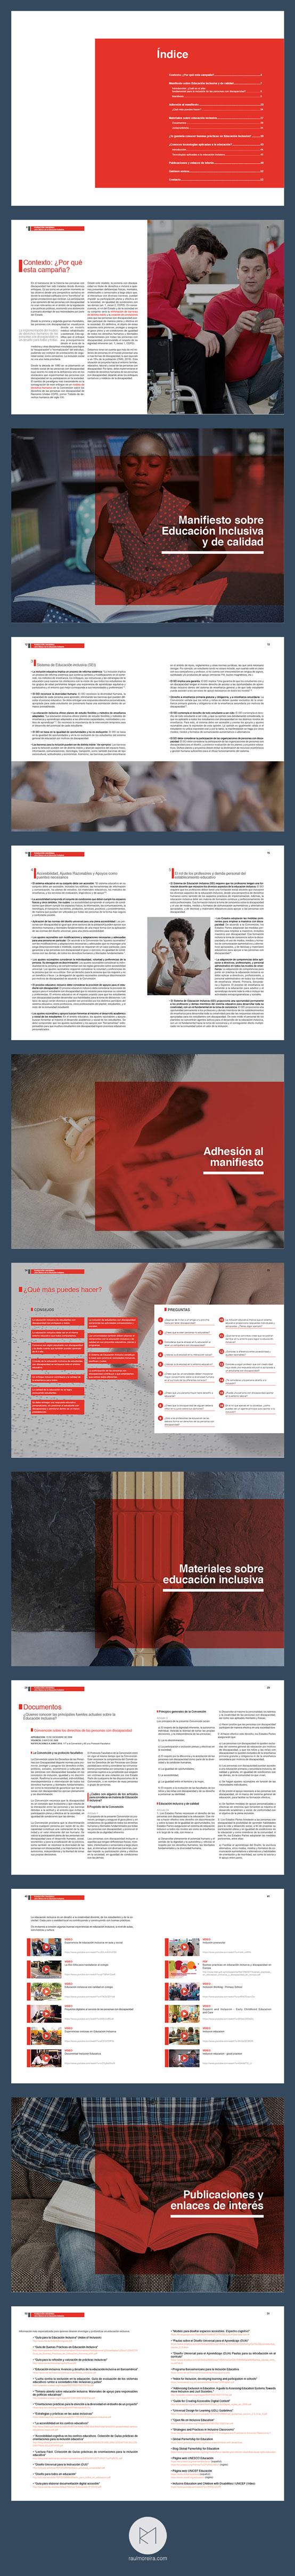 Fundación Universia - Maquetación Libro